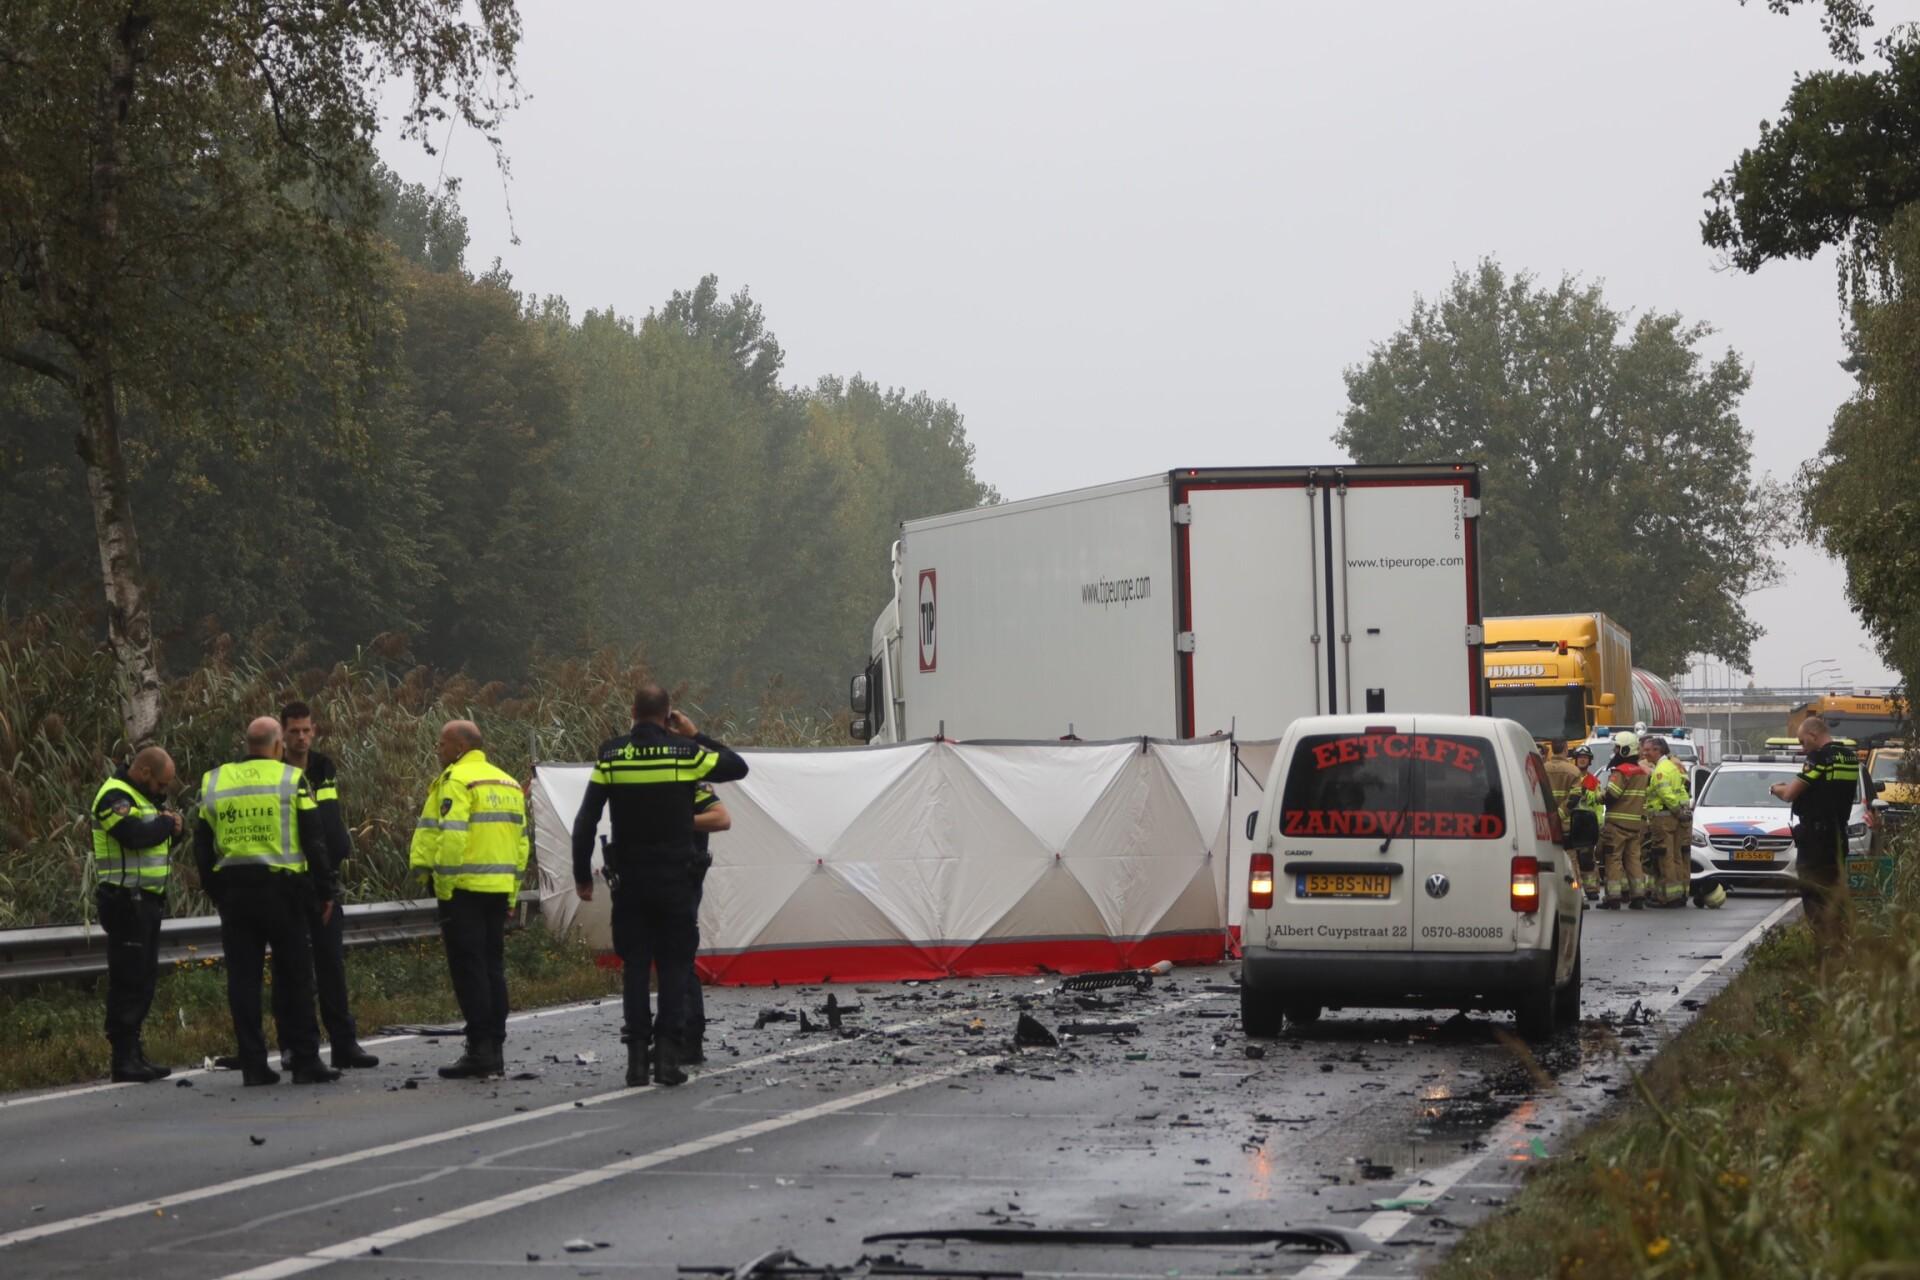 Ravage op N279 na ongeval met vrachtwagen